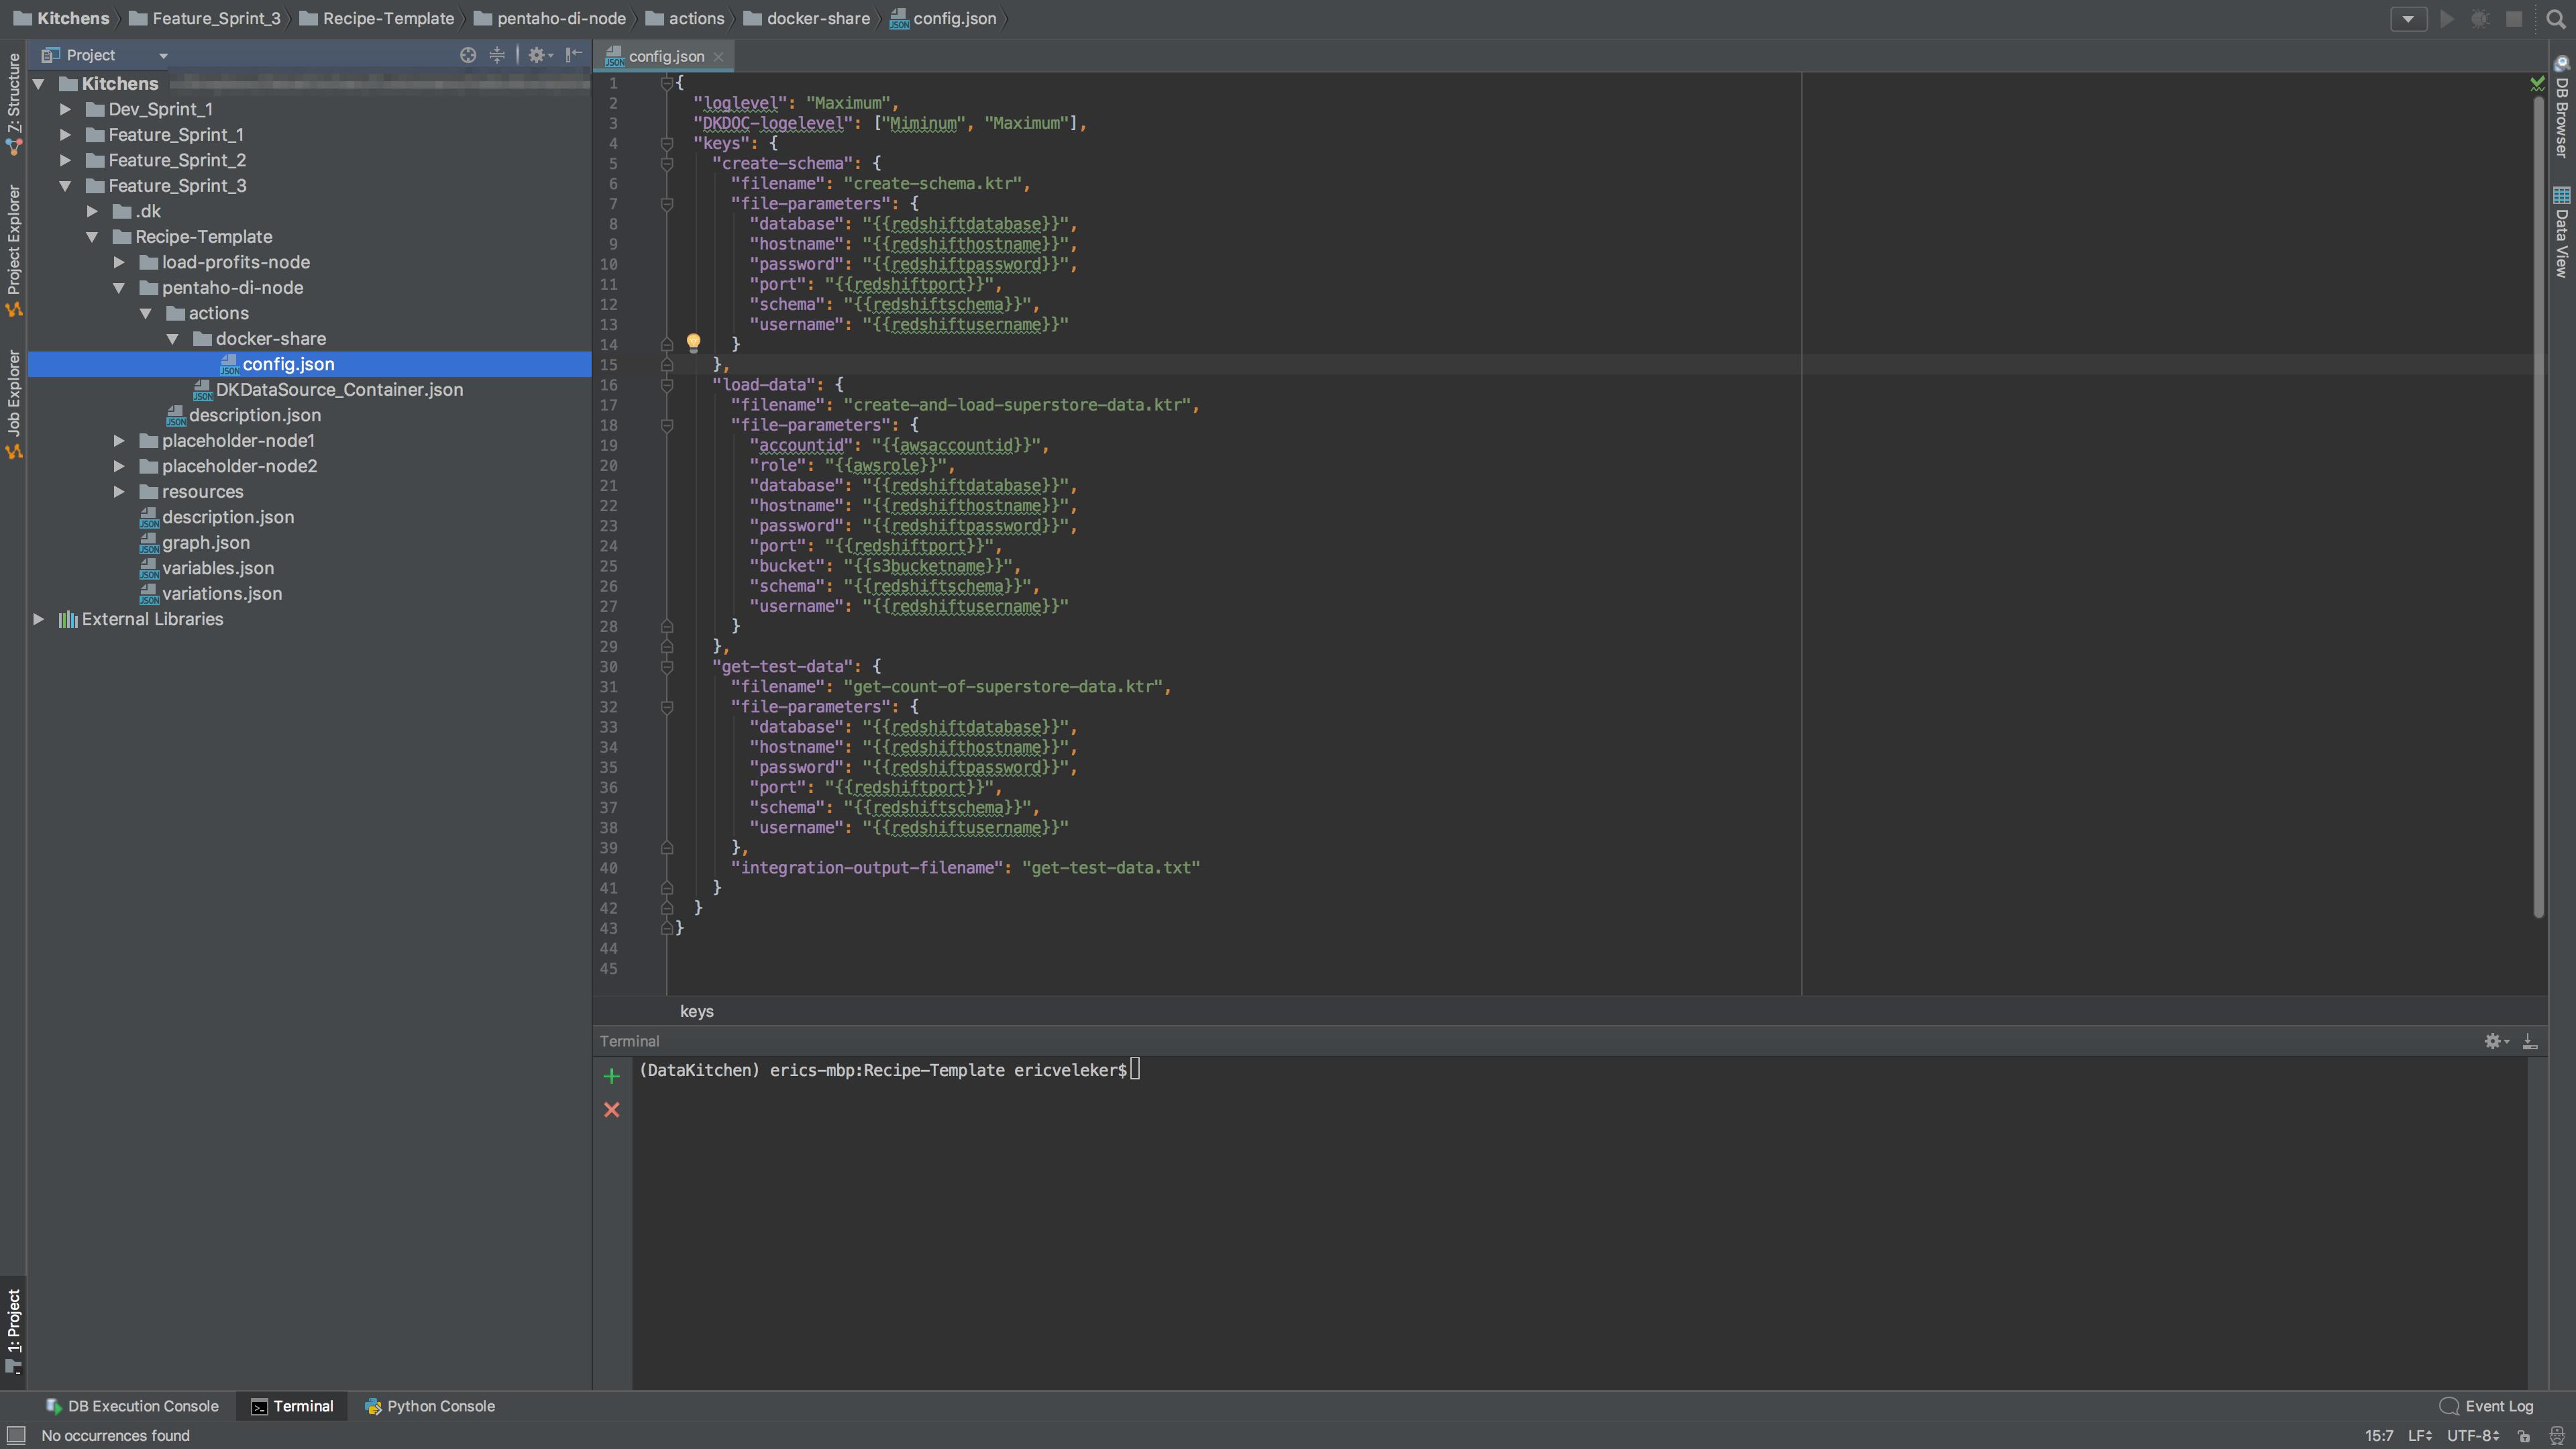 A view of **pentaho-di-node**'s configuration file, **config.json**.